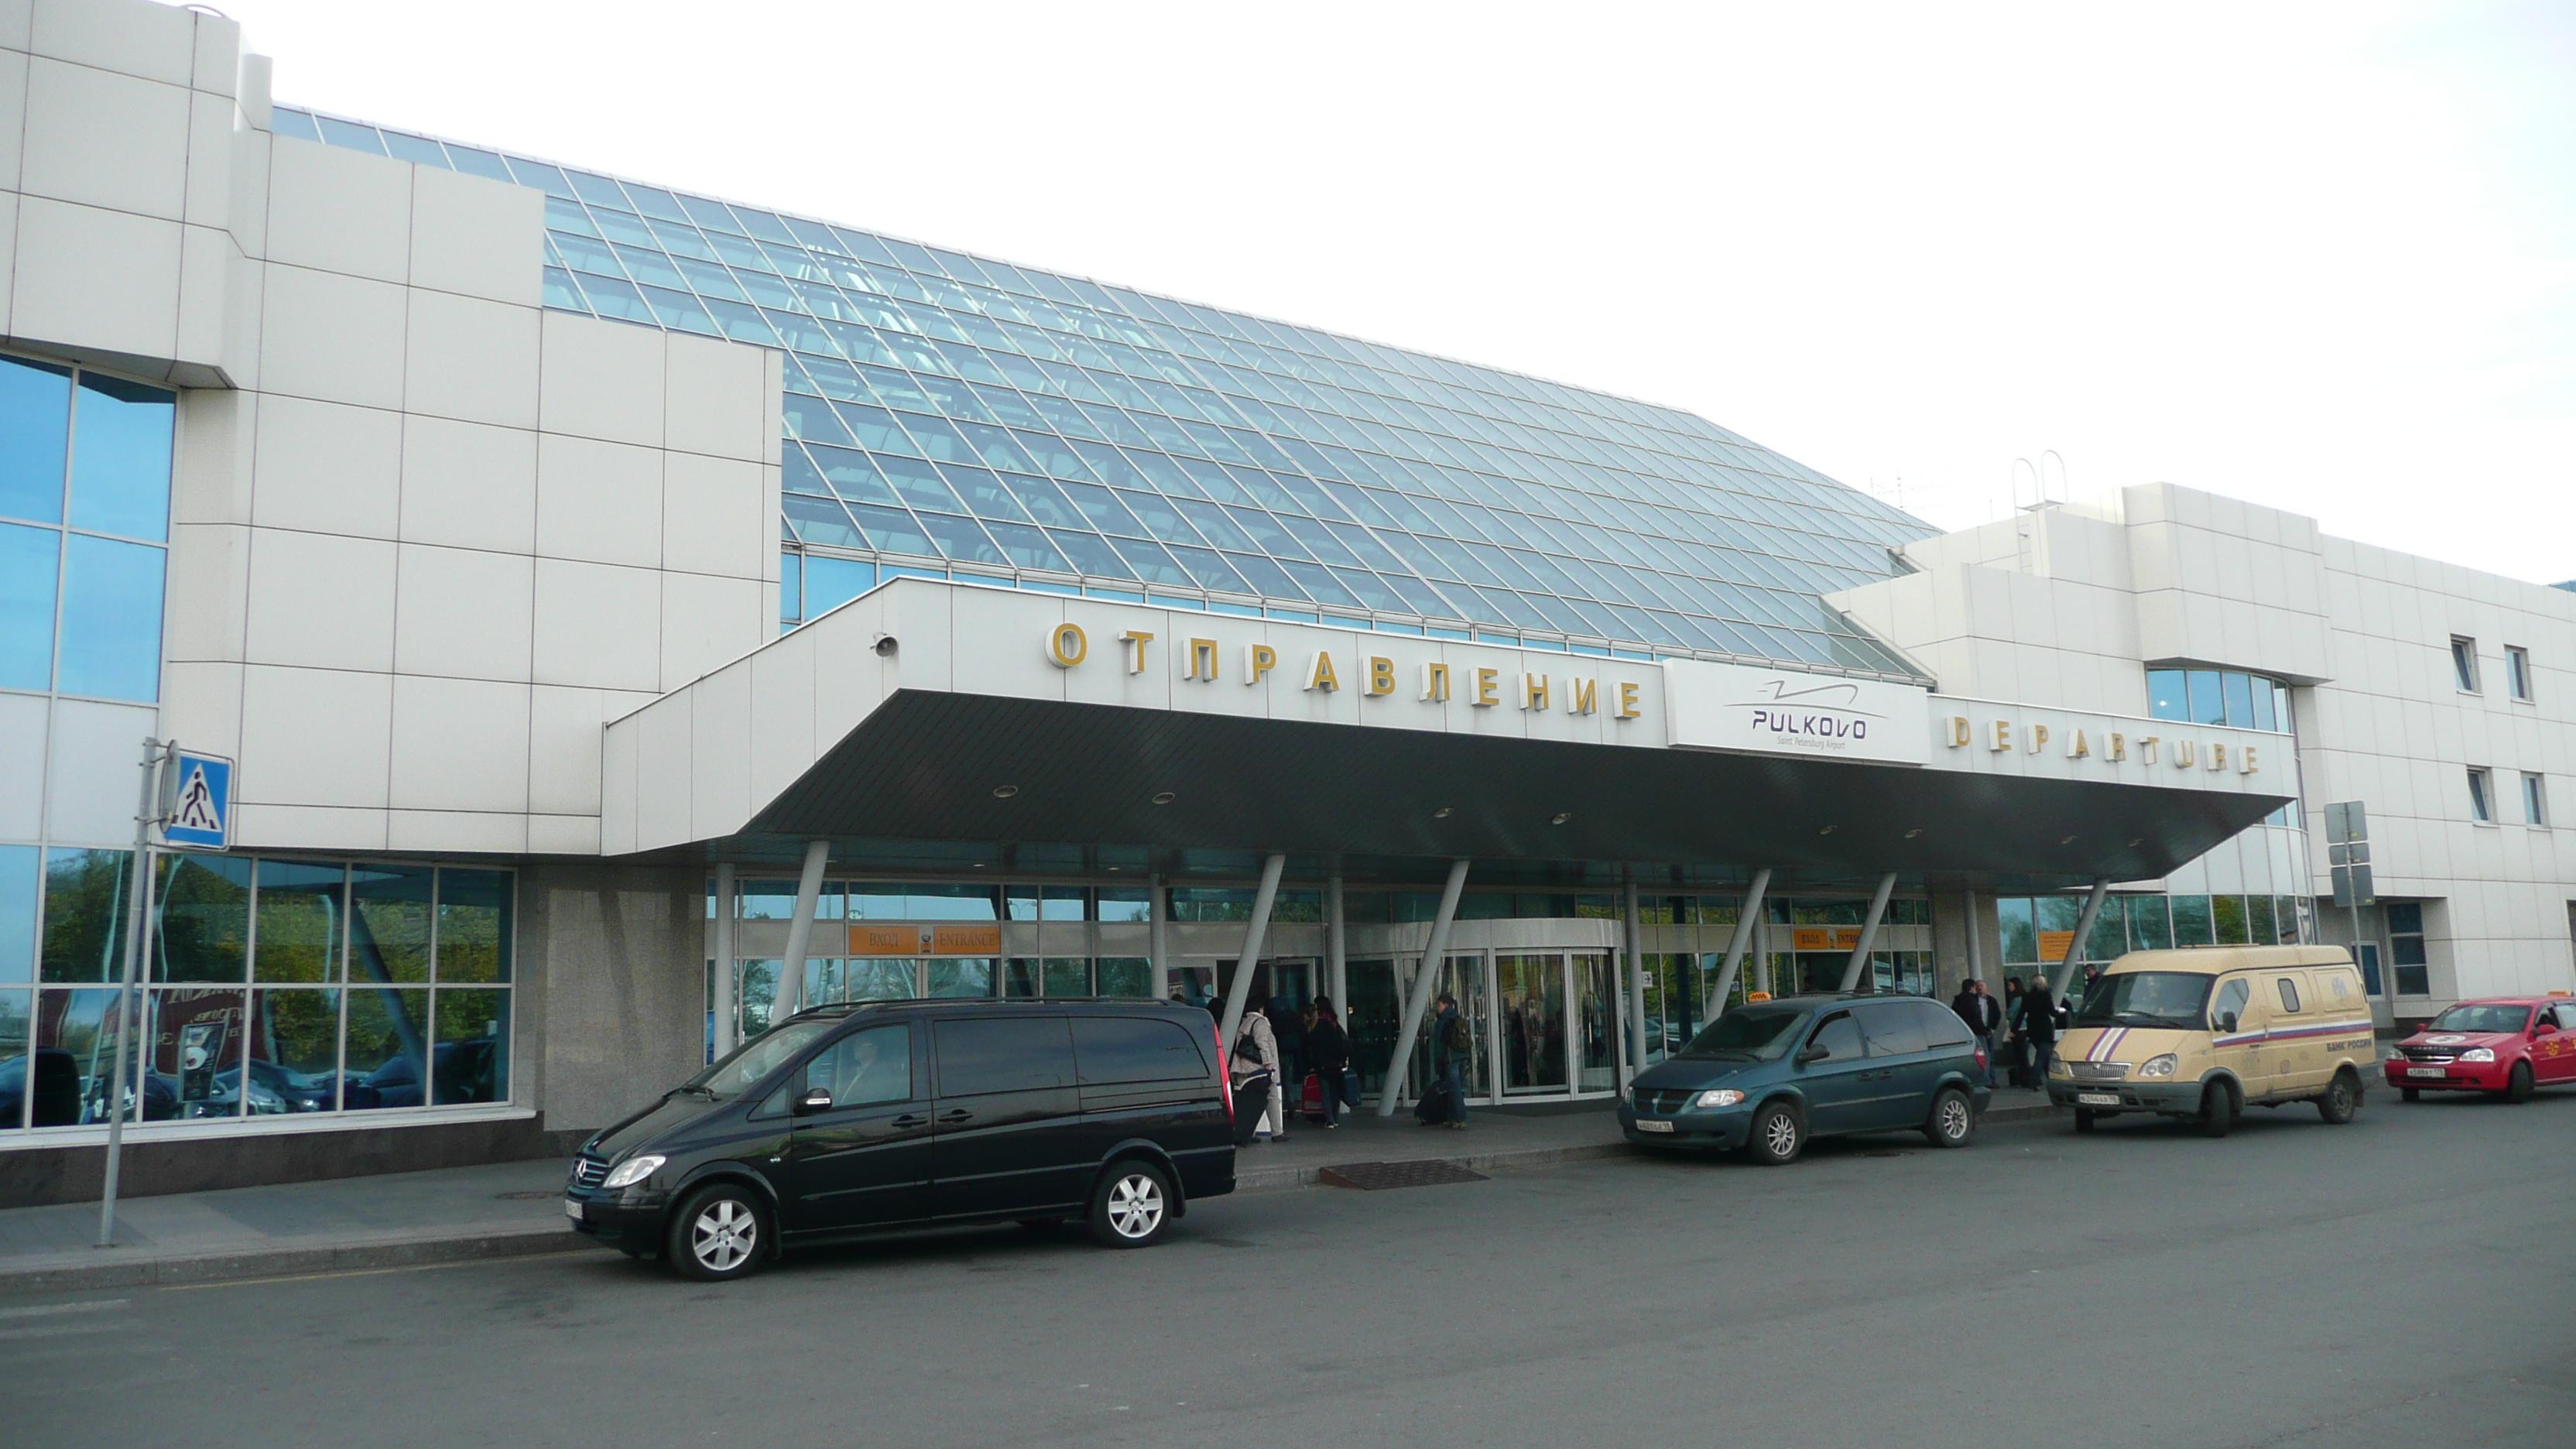 An Ii B B Fileairport Pulkovo Ii Bjpg Wikimedia Commons